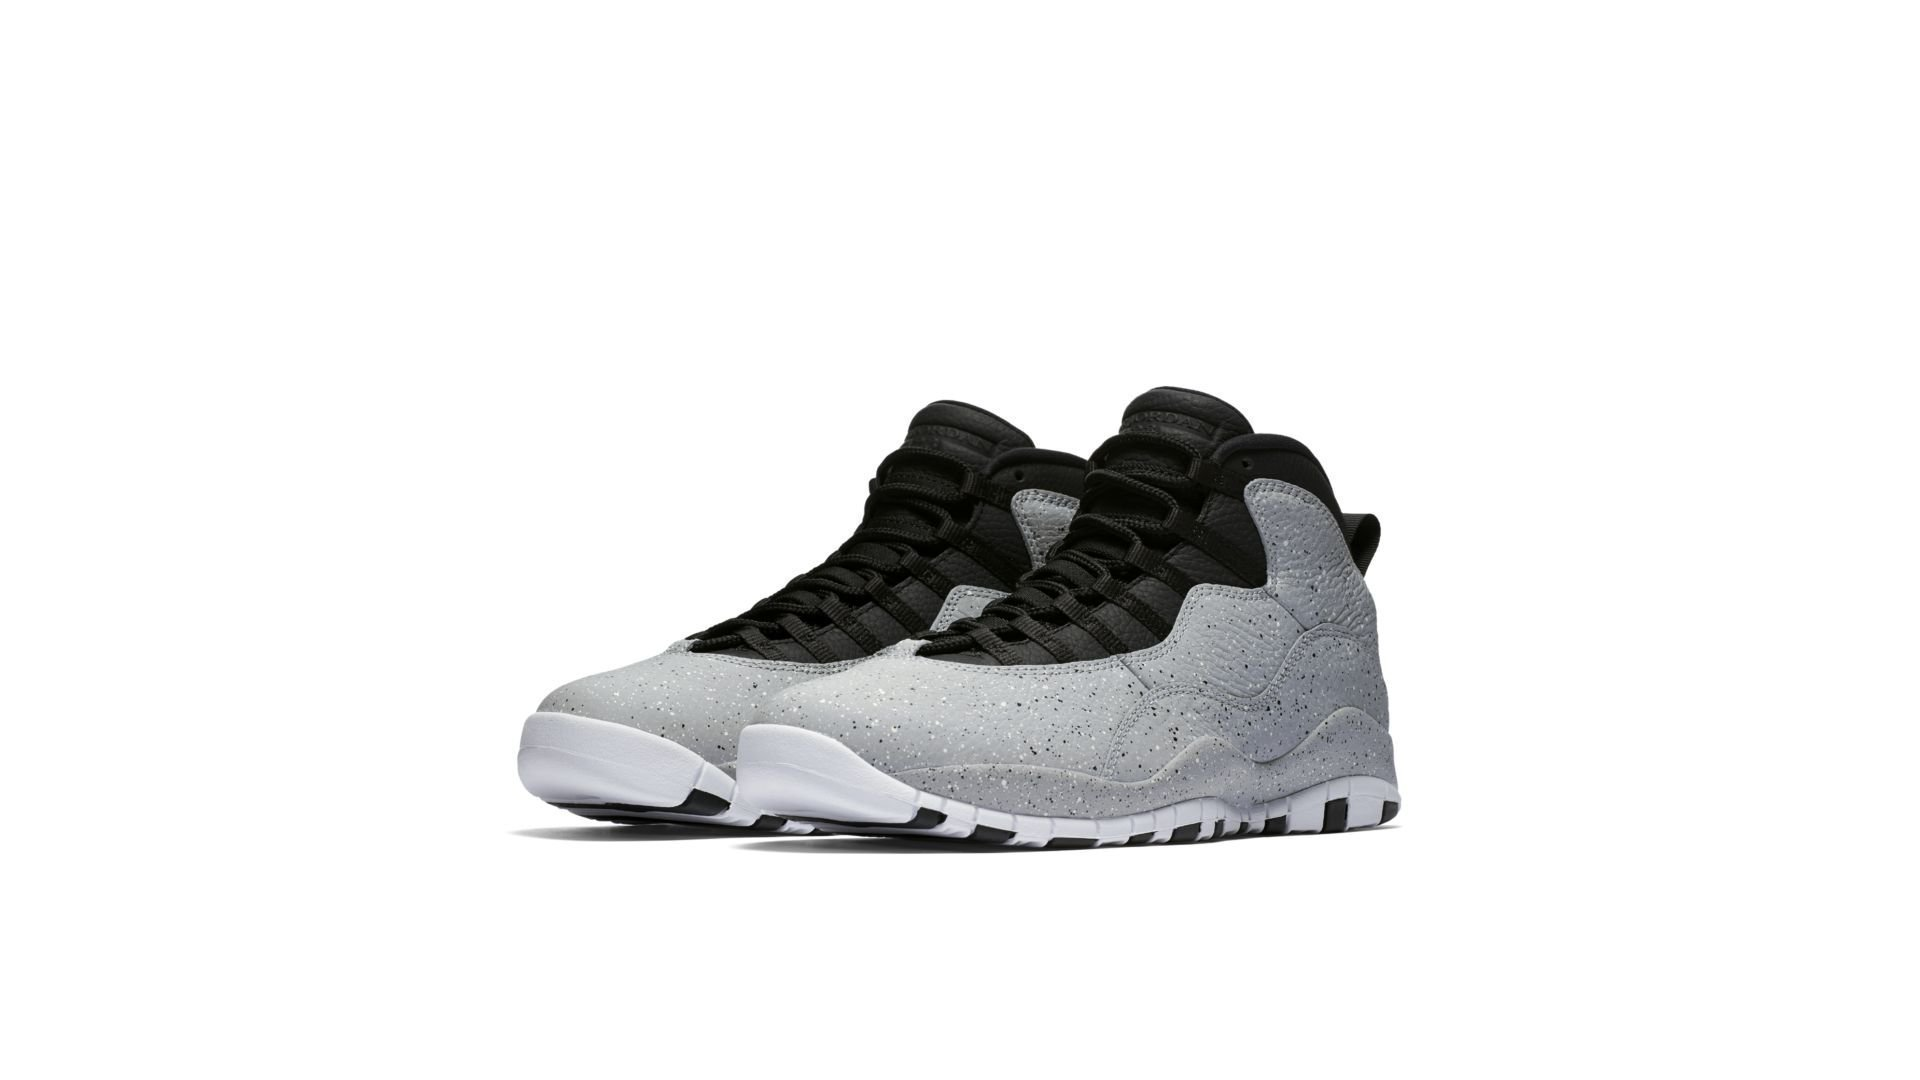 Jordan 10 Retro Light Smoke Grey (310805-062)